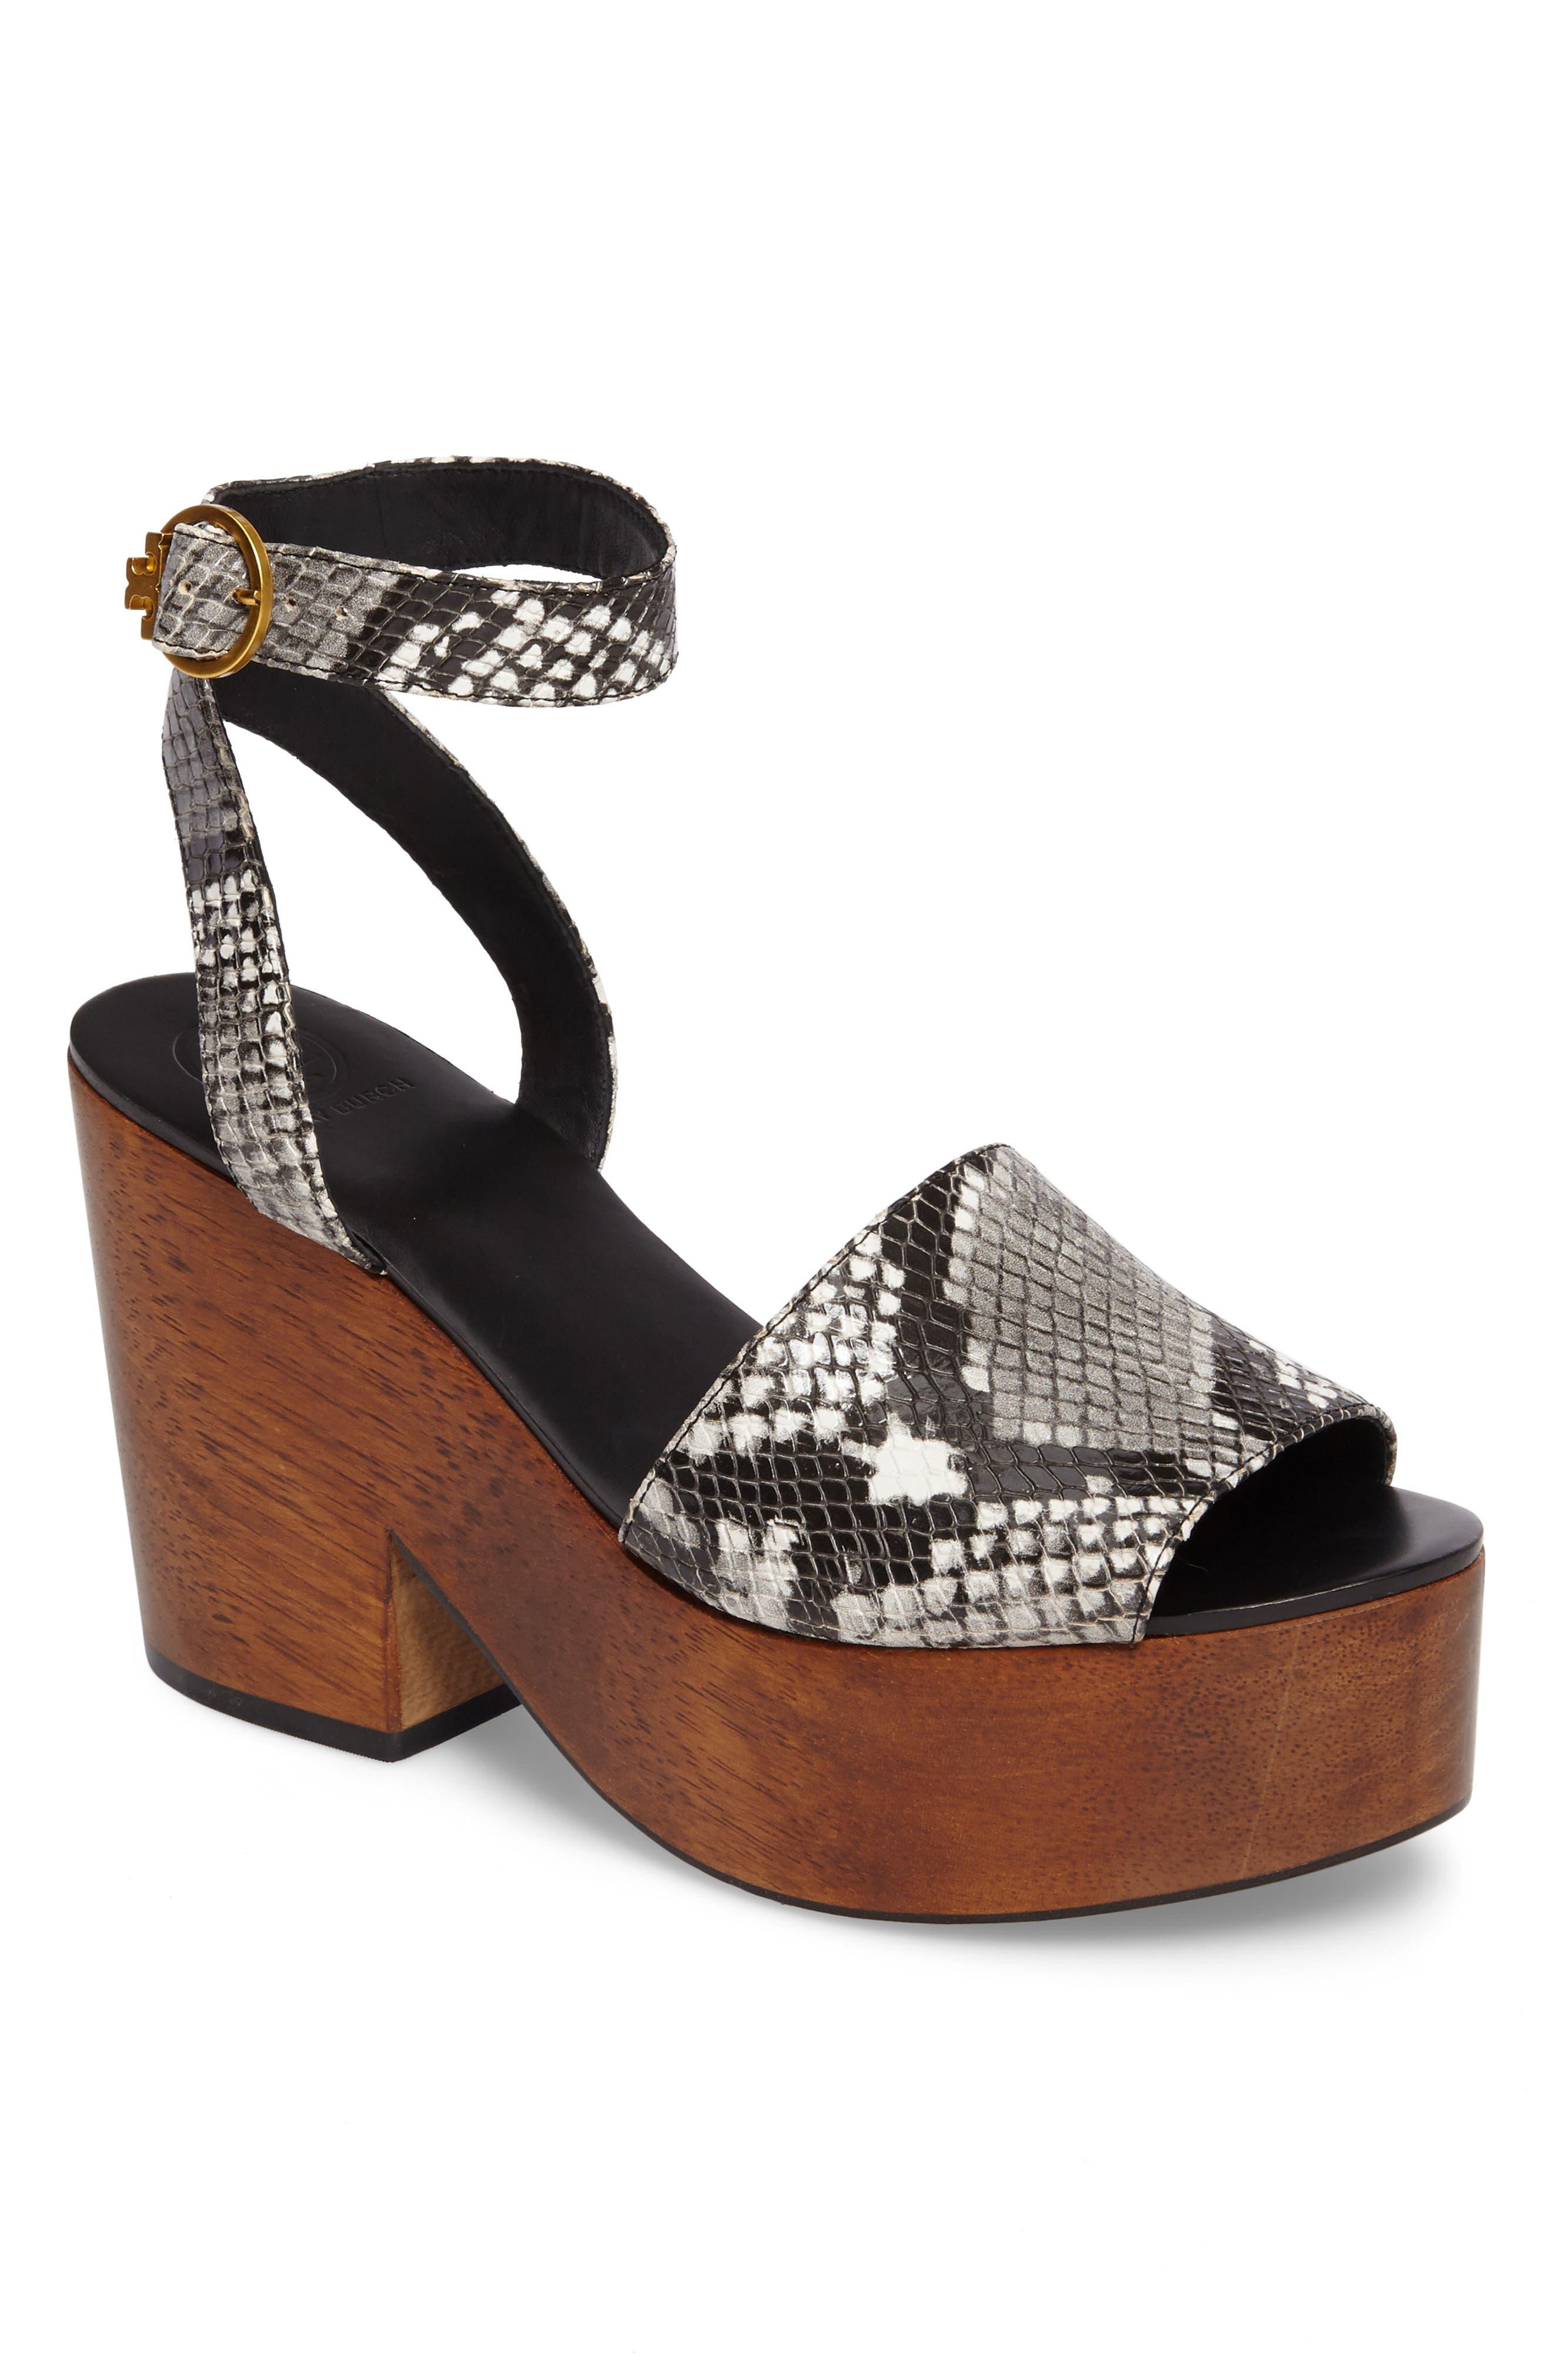 Camilla Platform Sandal,                             Main thumbnail 1, color,                             Roccia Black/ White